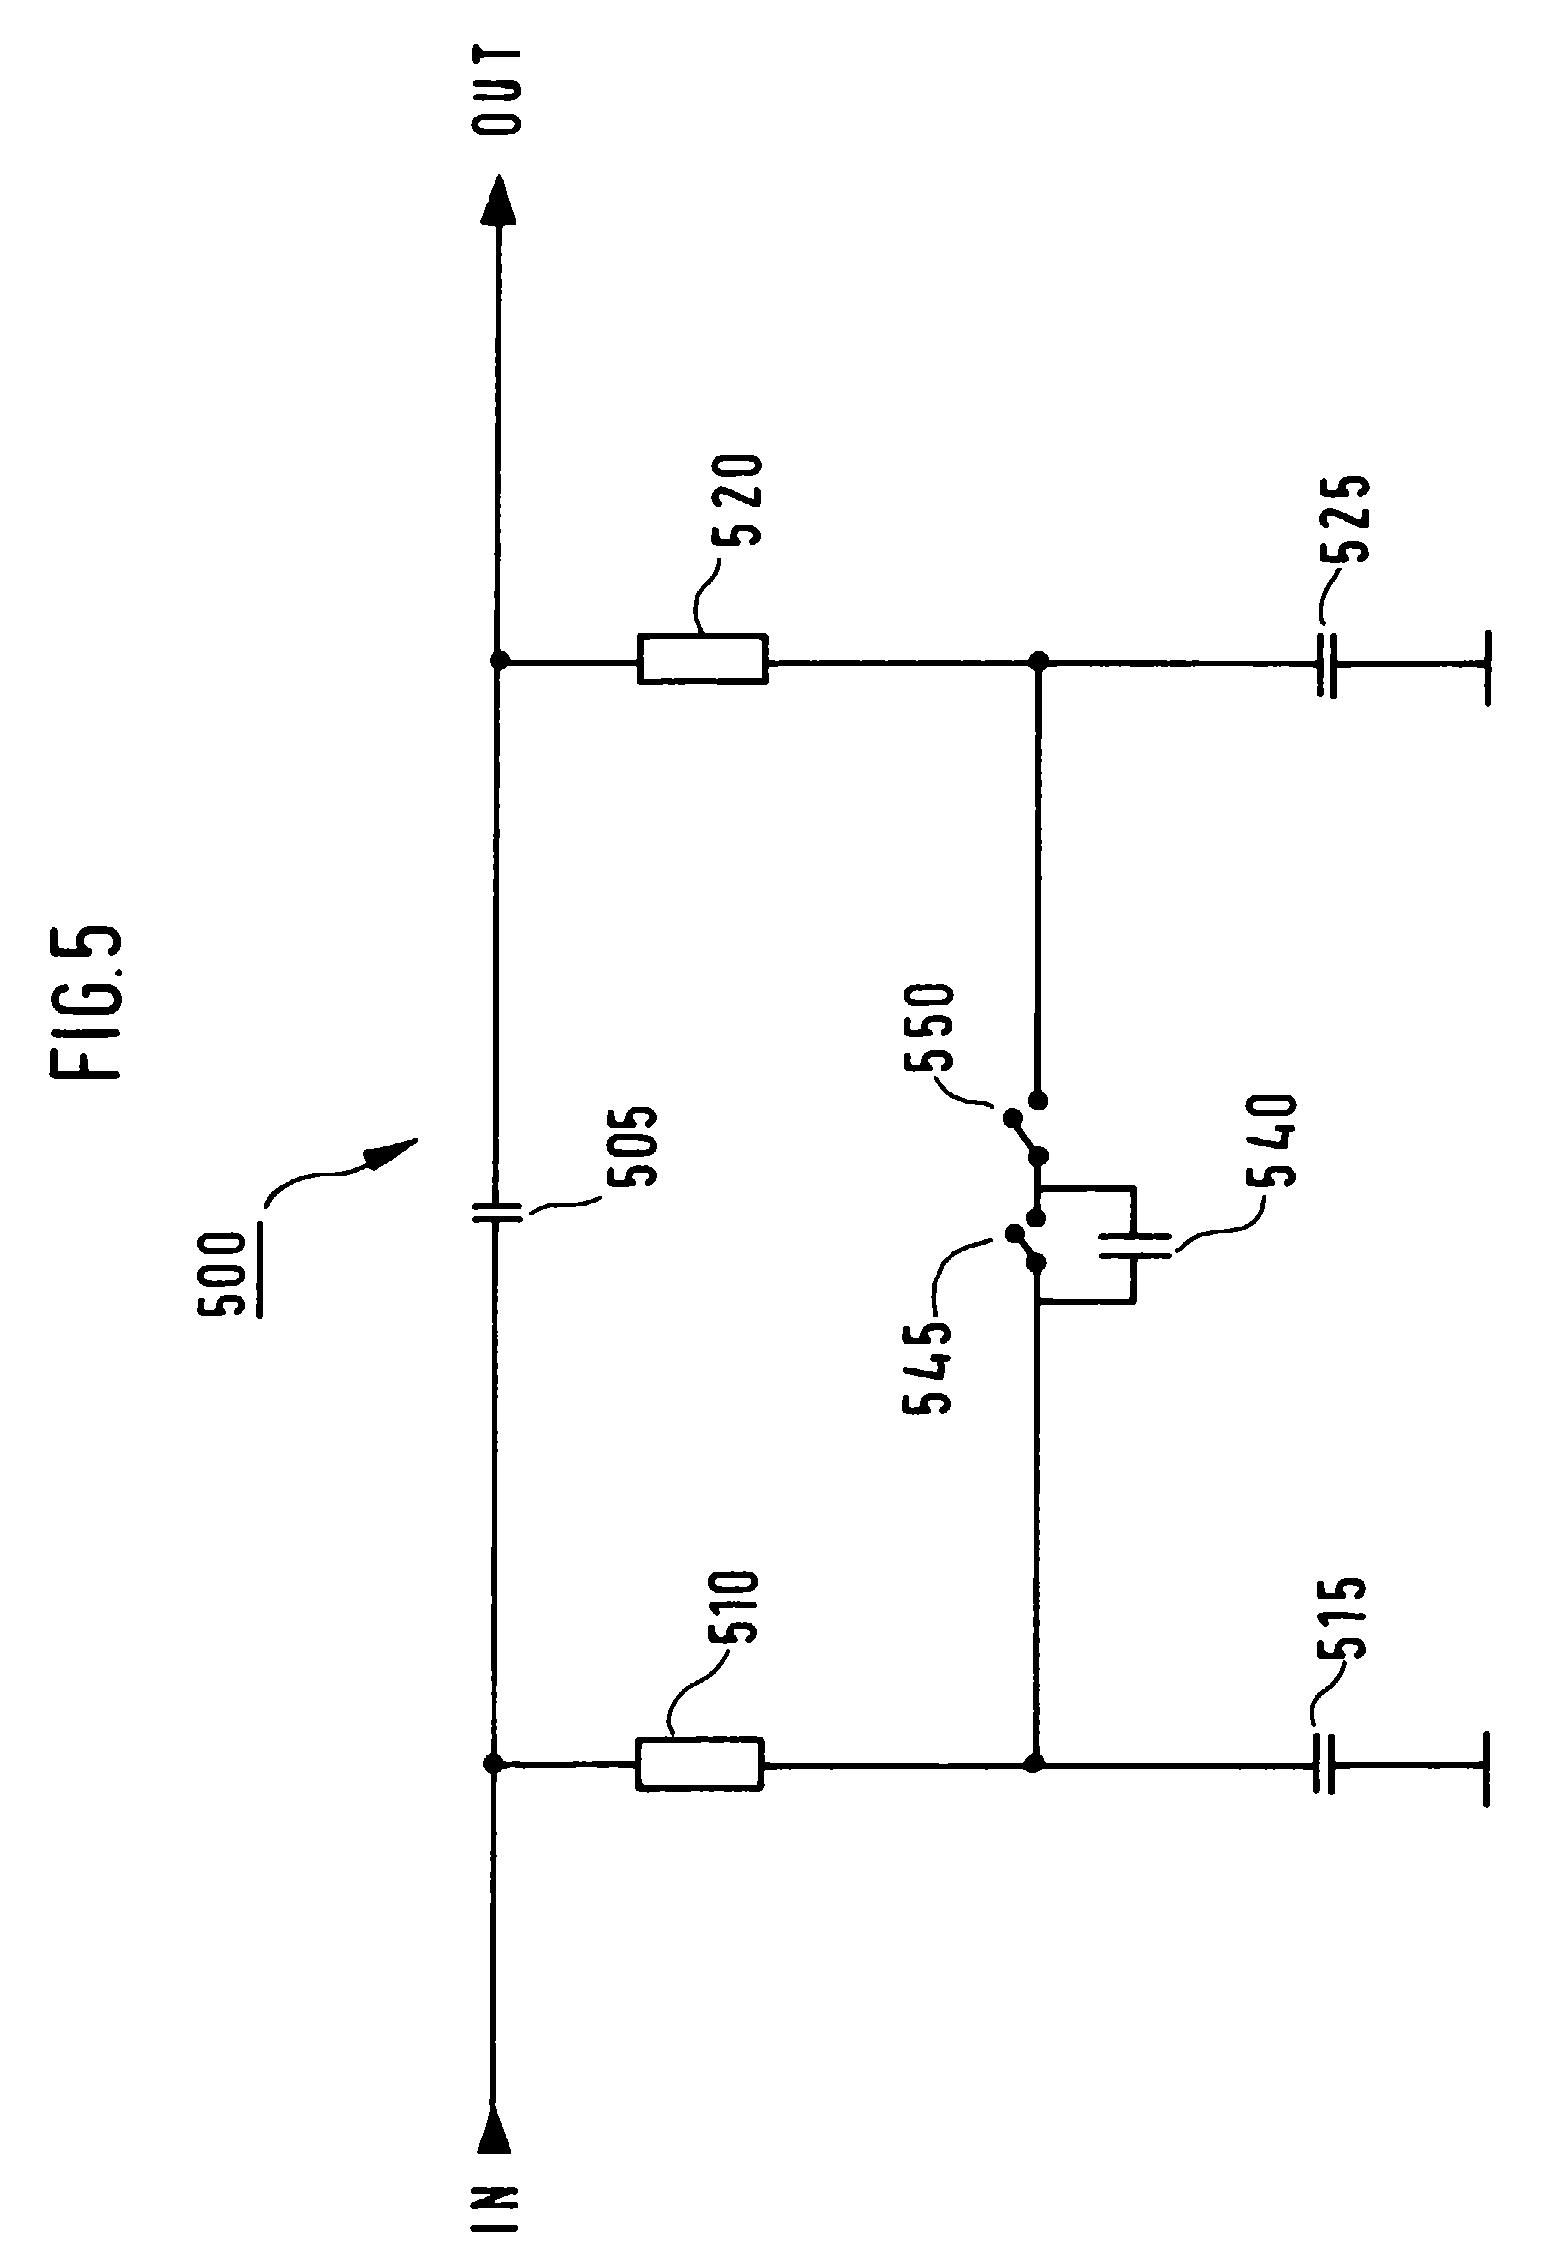 sc2272l4应用电路图